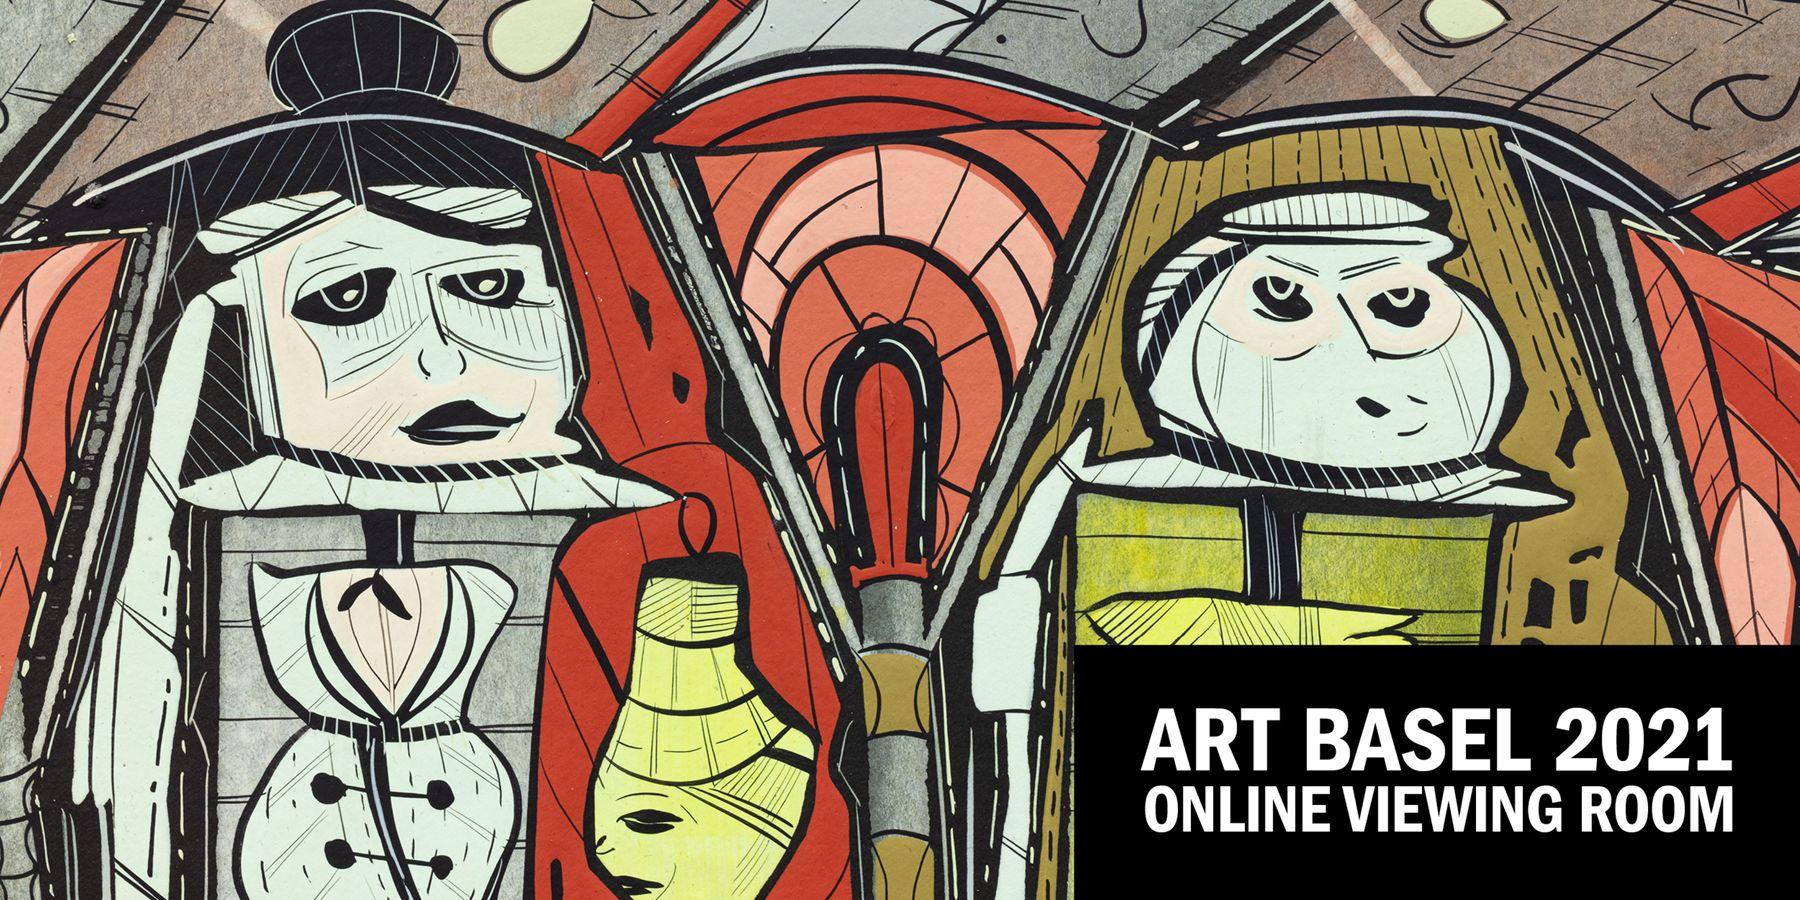 Art Basel 2021 Online Viewing Room